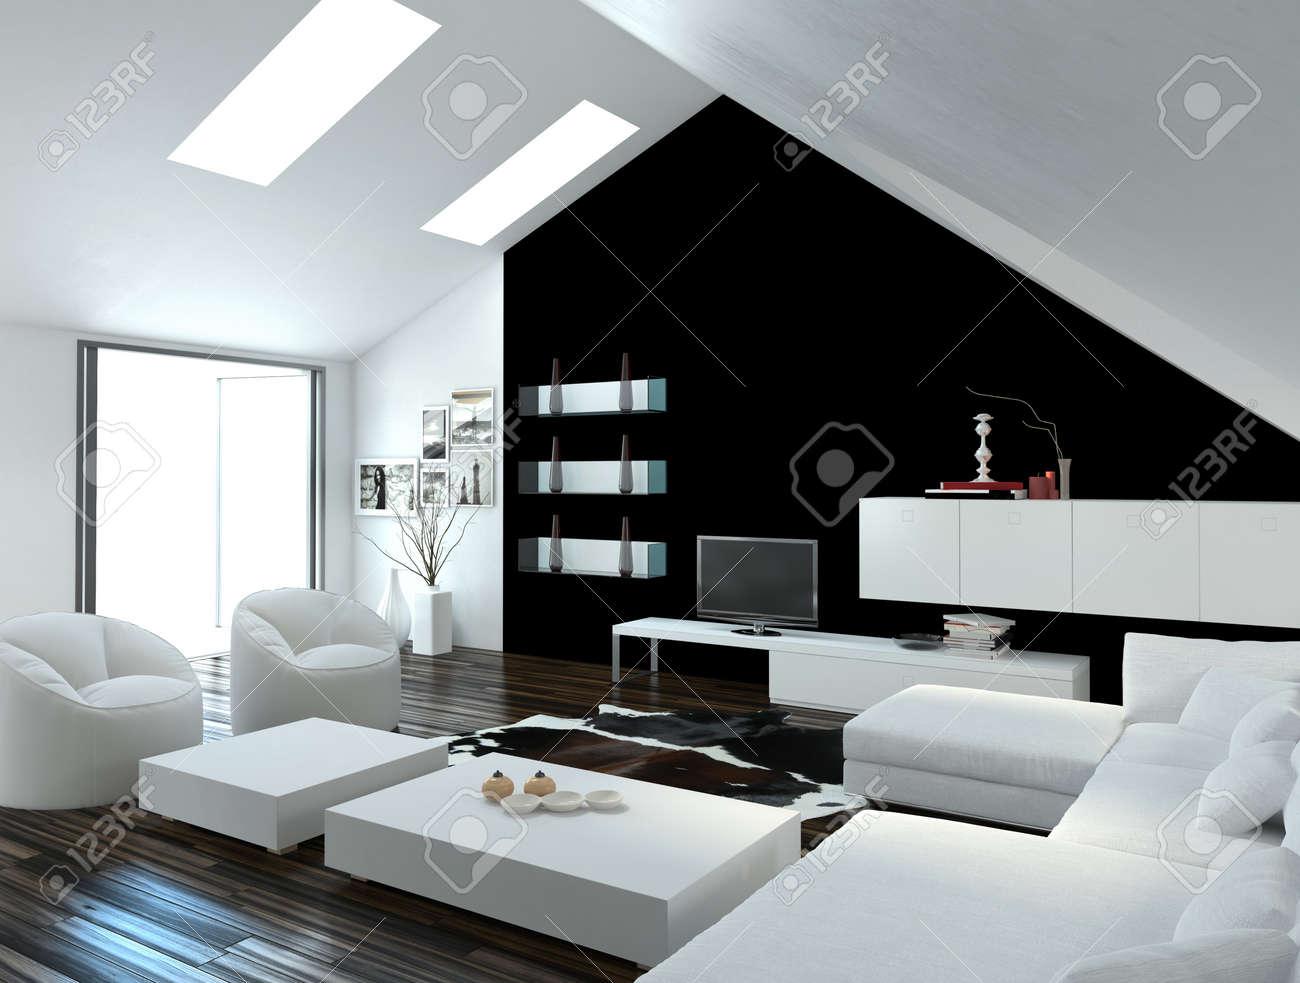 Moderne compacte loft woonkamer interieur met dakramen in het ...